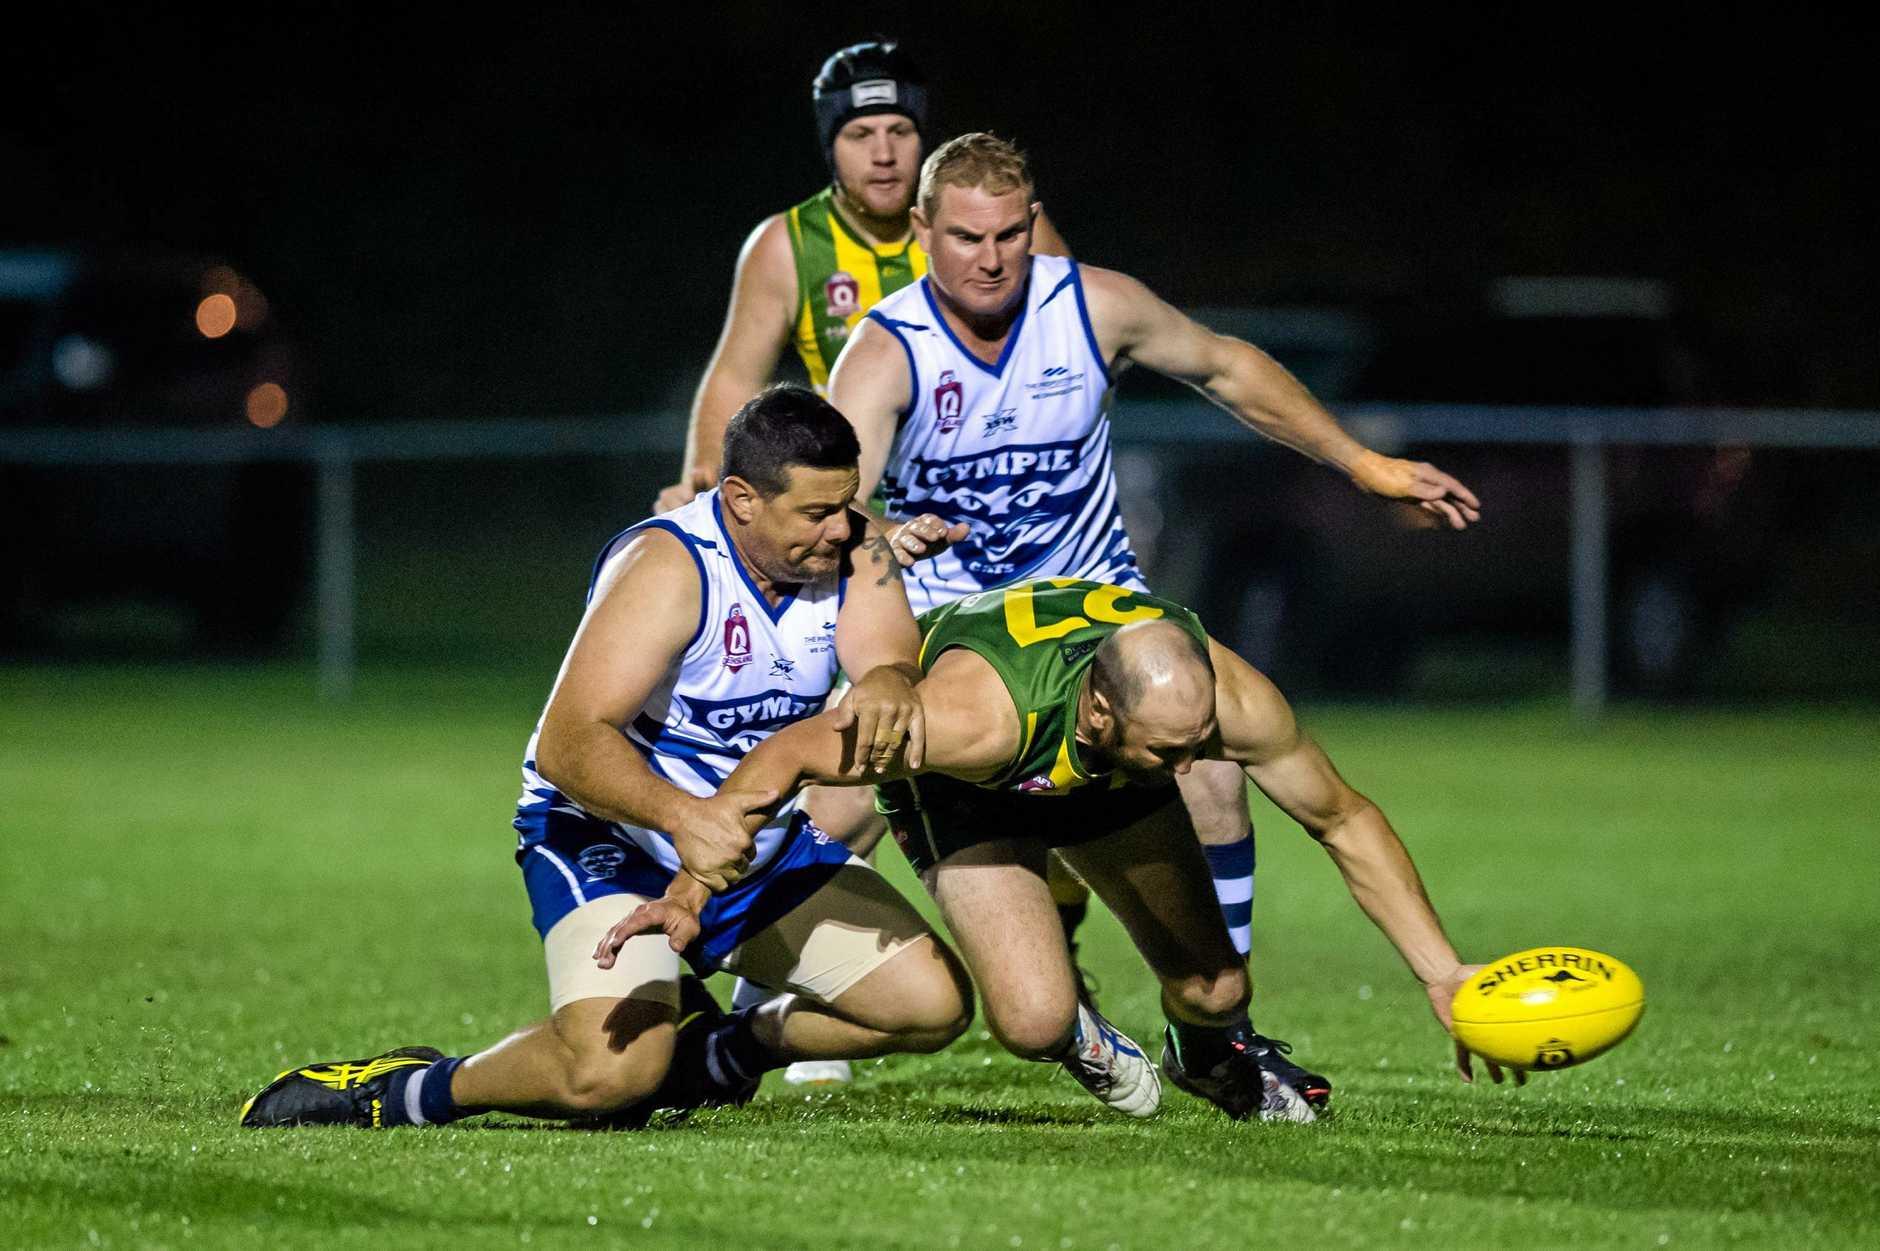 Aussie Rules, Graham Grummitt Gympie Cats vs Maroochydore Roos